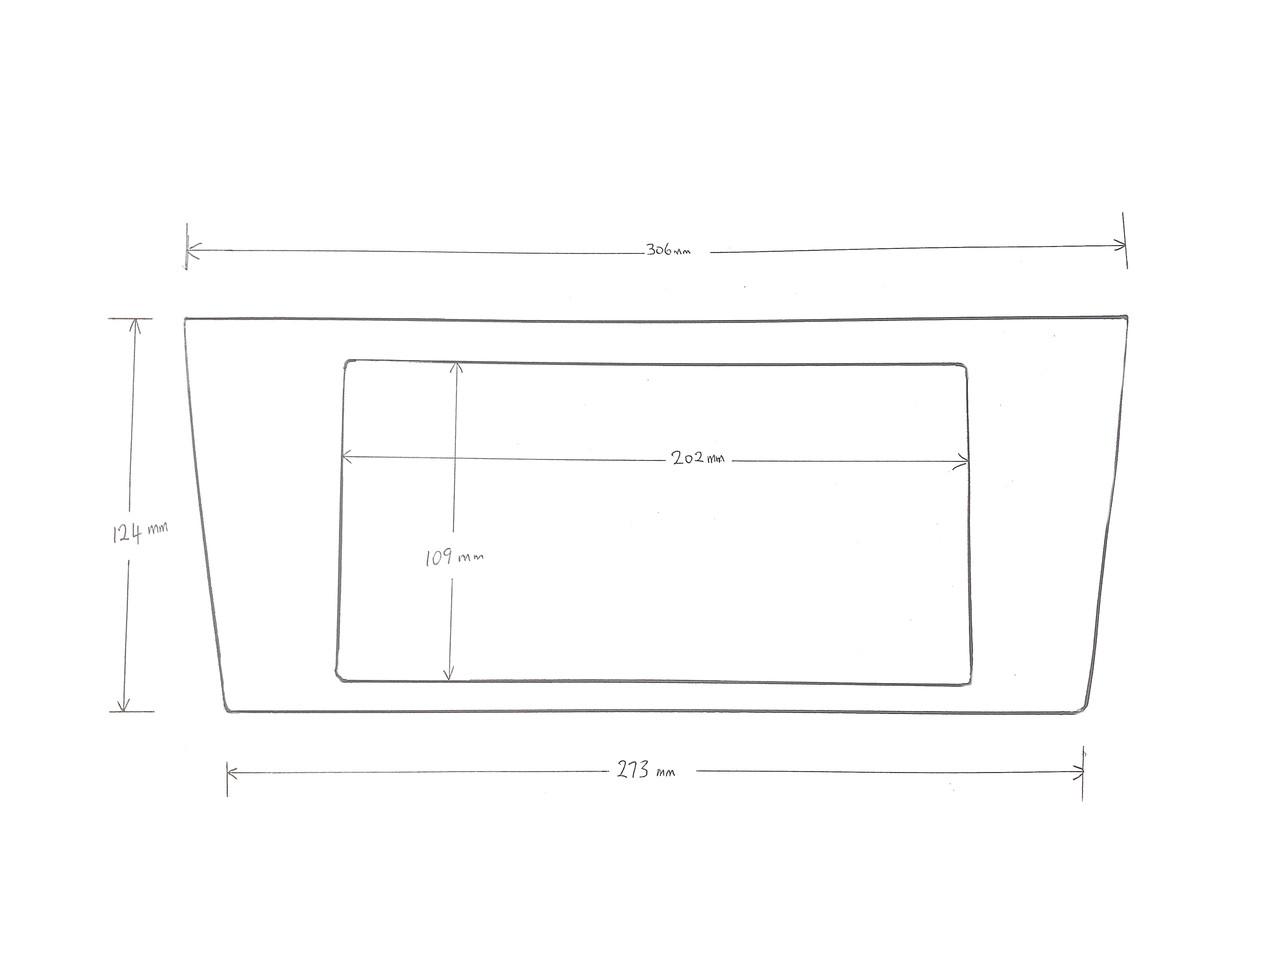 BN/BS Legacy A/V Fascia Panel Dimensions at AVOJDM.com